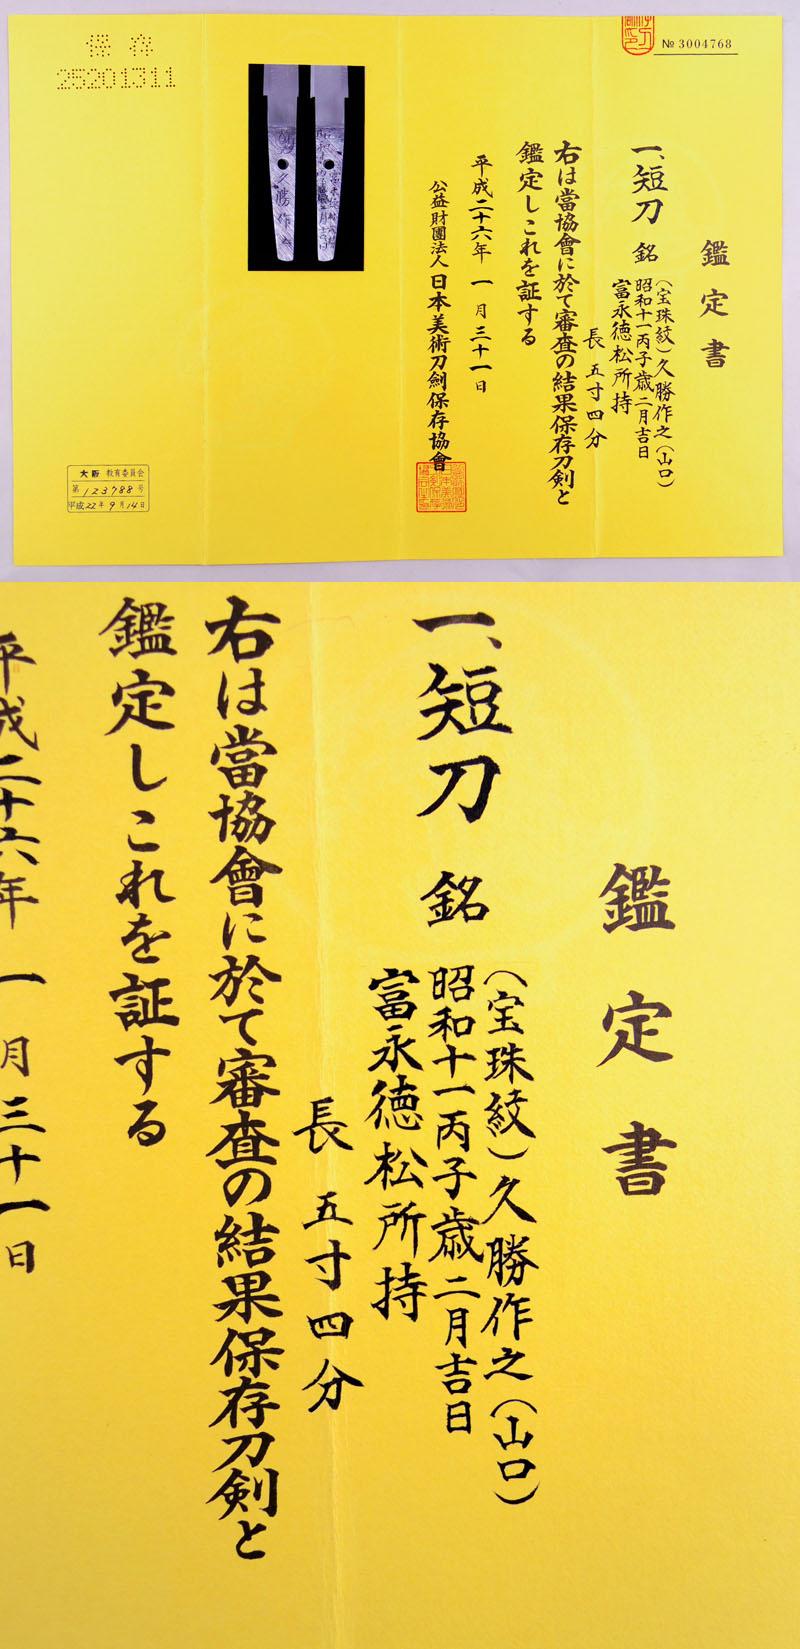 久勝作之(山口)(竹島久勝) Picture of Certificate